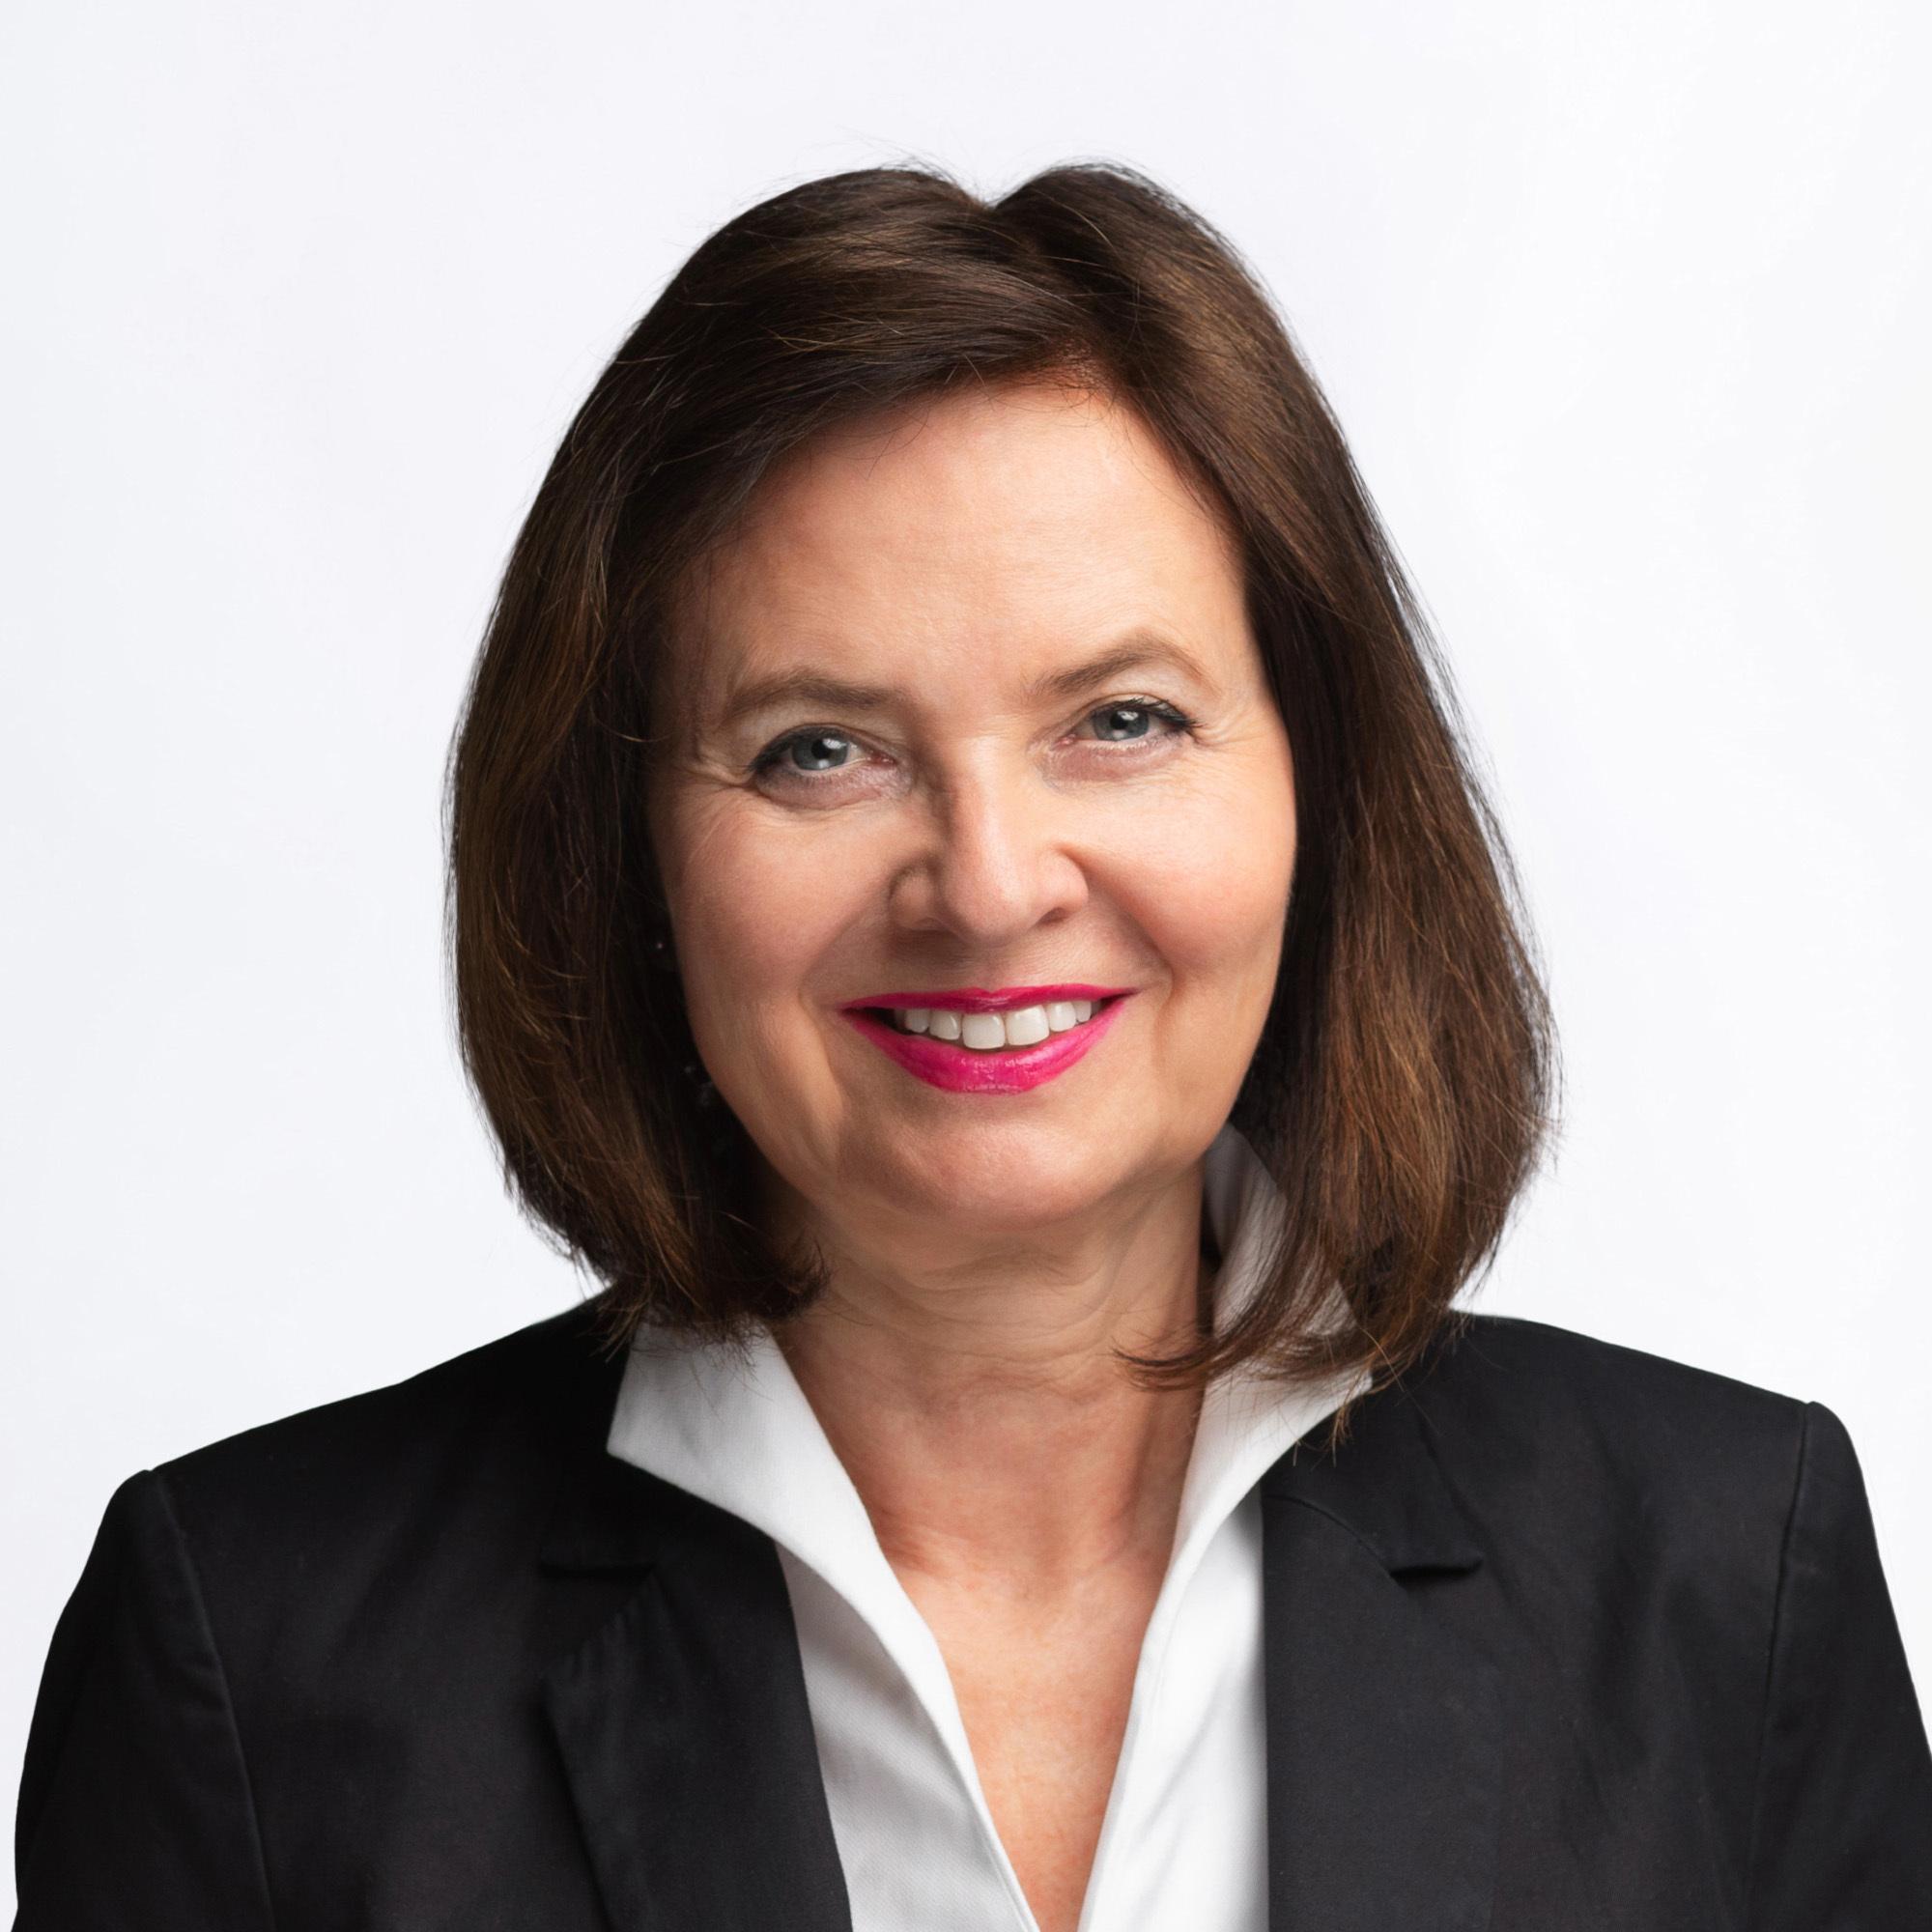 Christine Konlechner Leeb